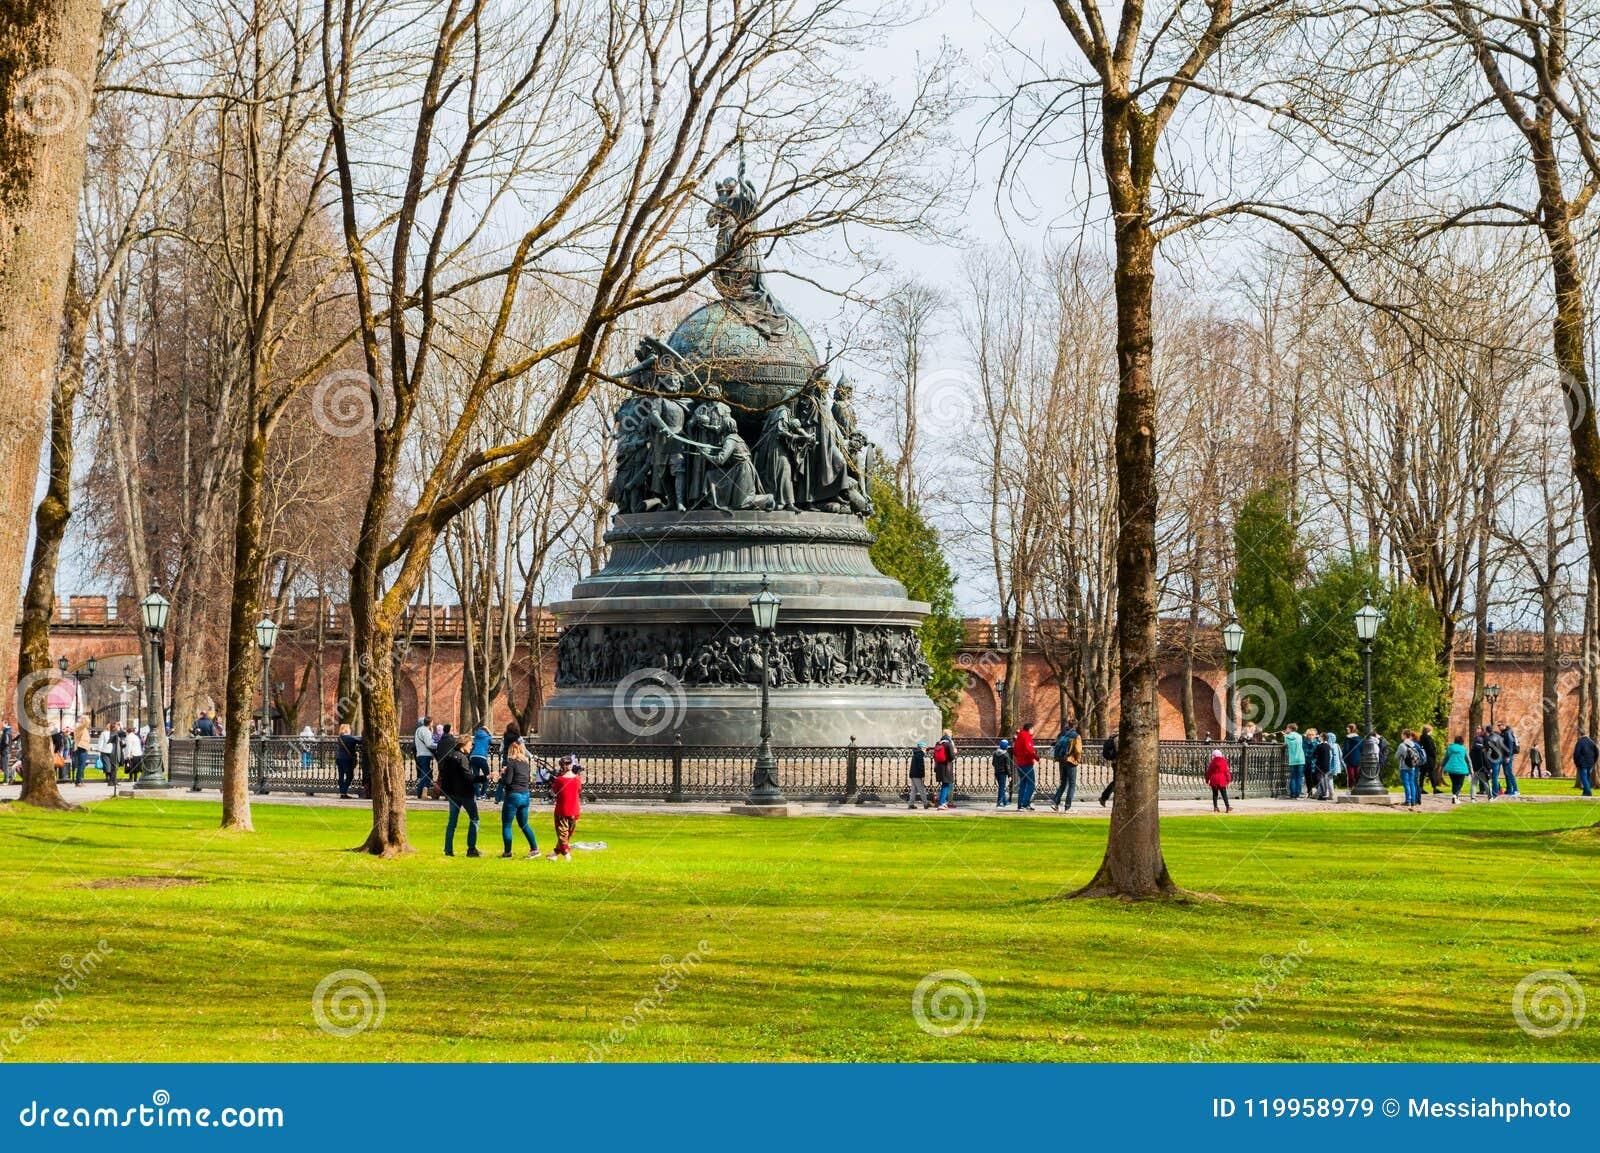 Kremlin, Veliky Novgorod: photos, excursions, address of sights 83